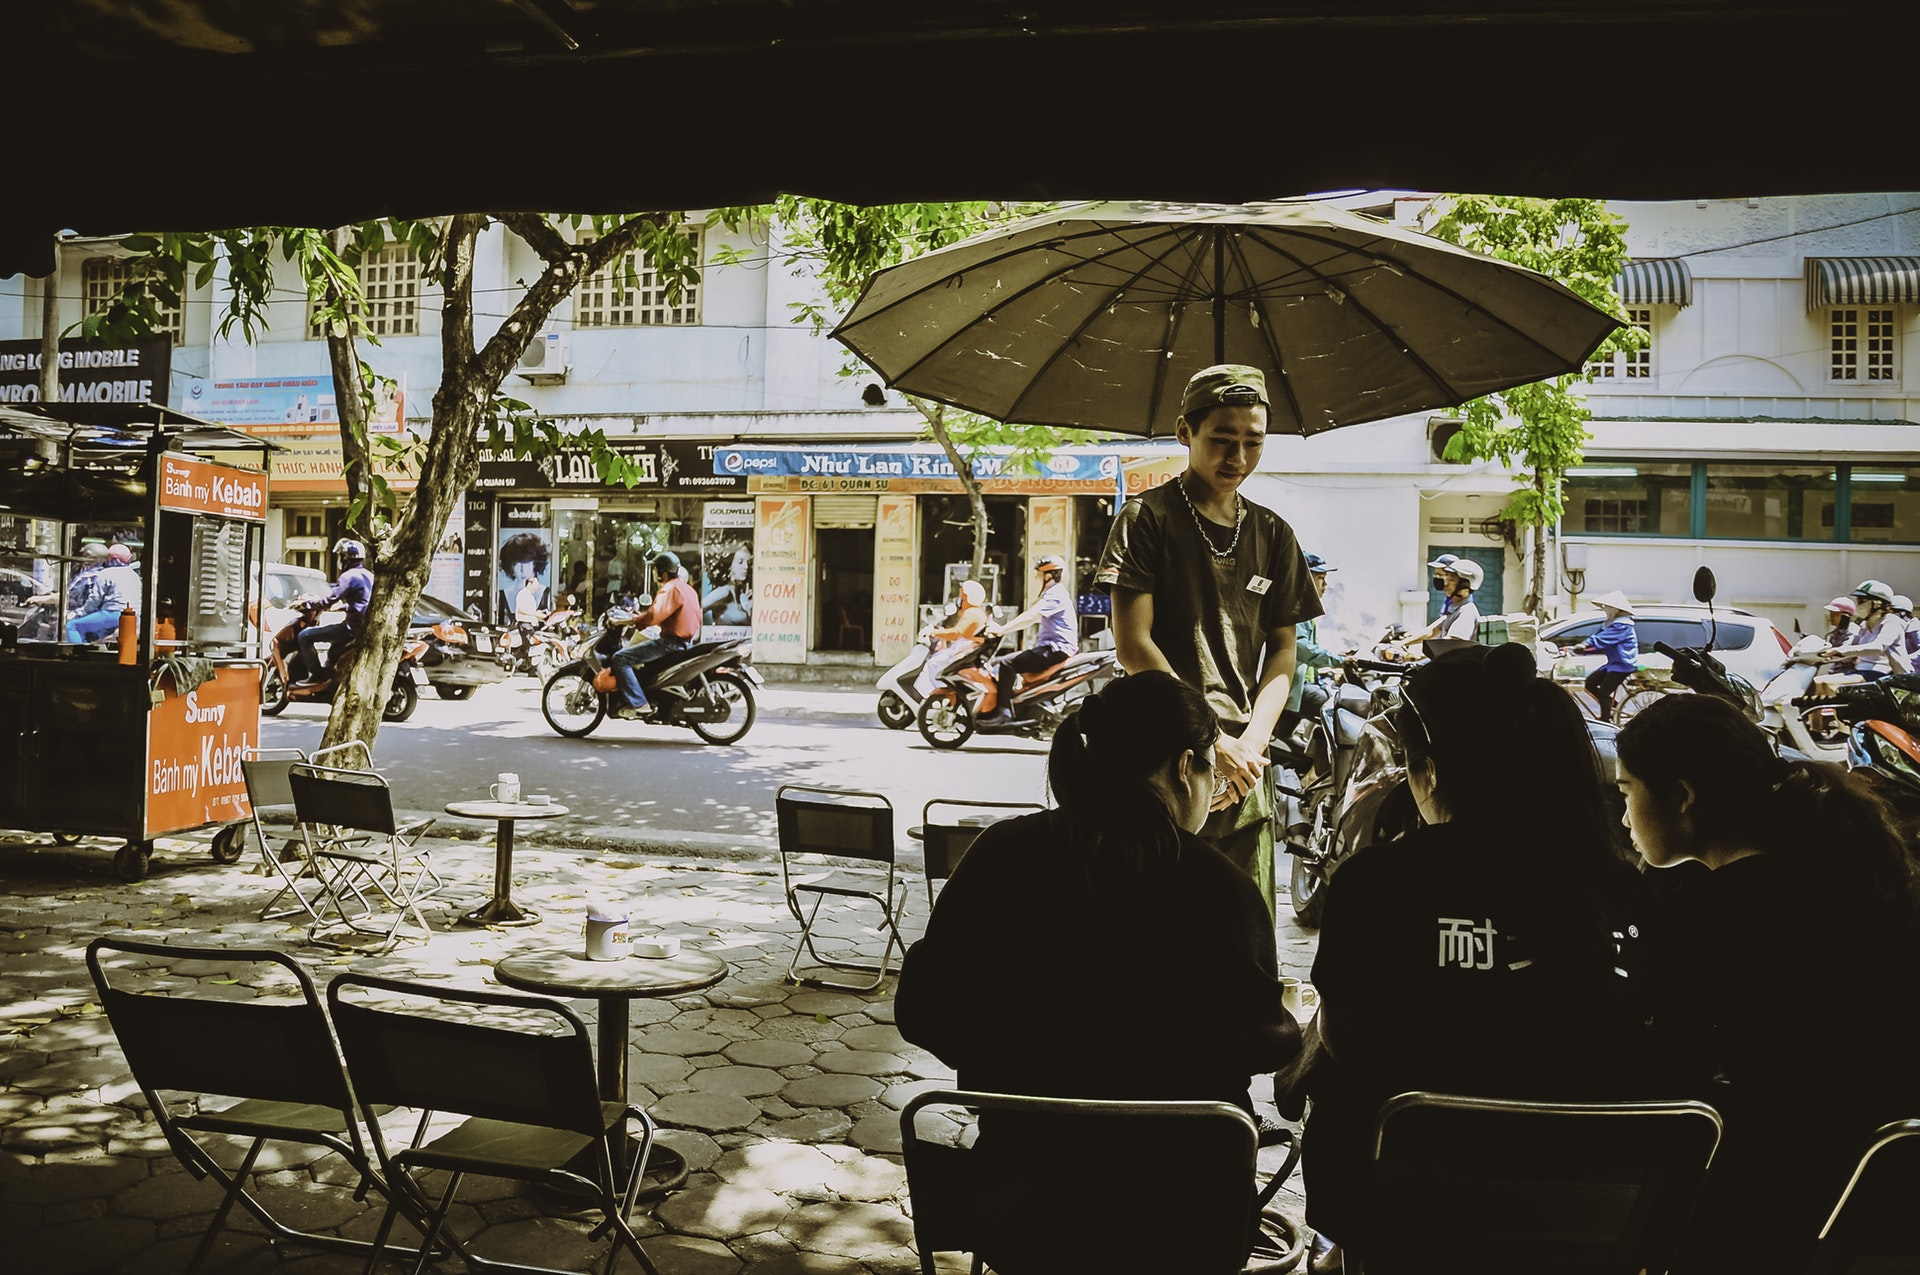 Vietnam-Boy-Street-Umbrella